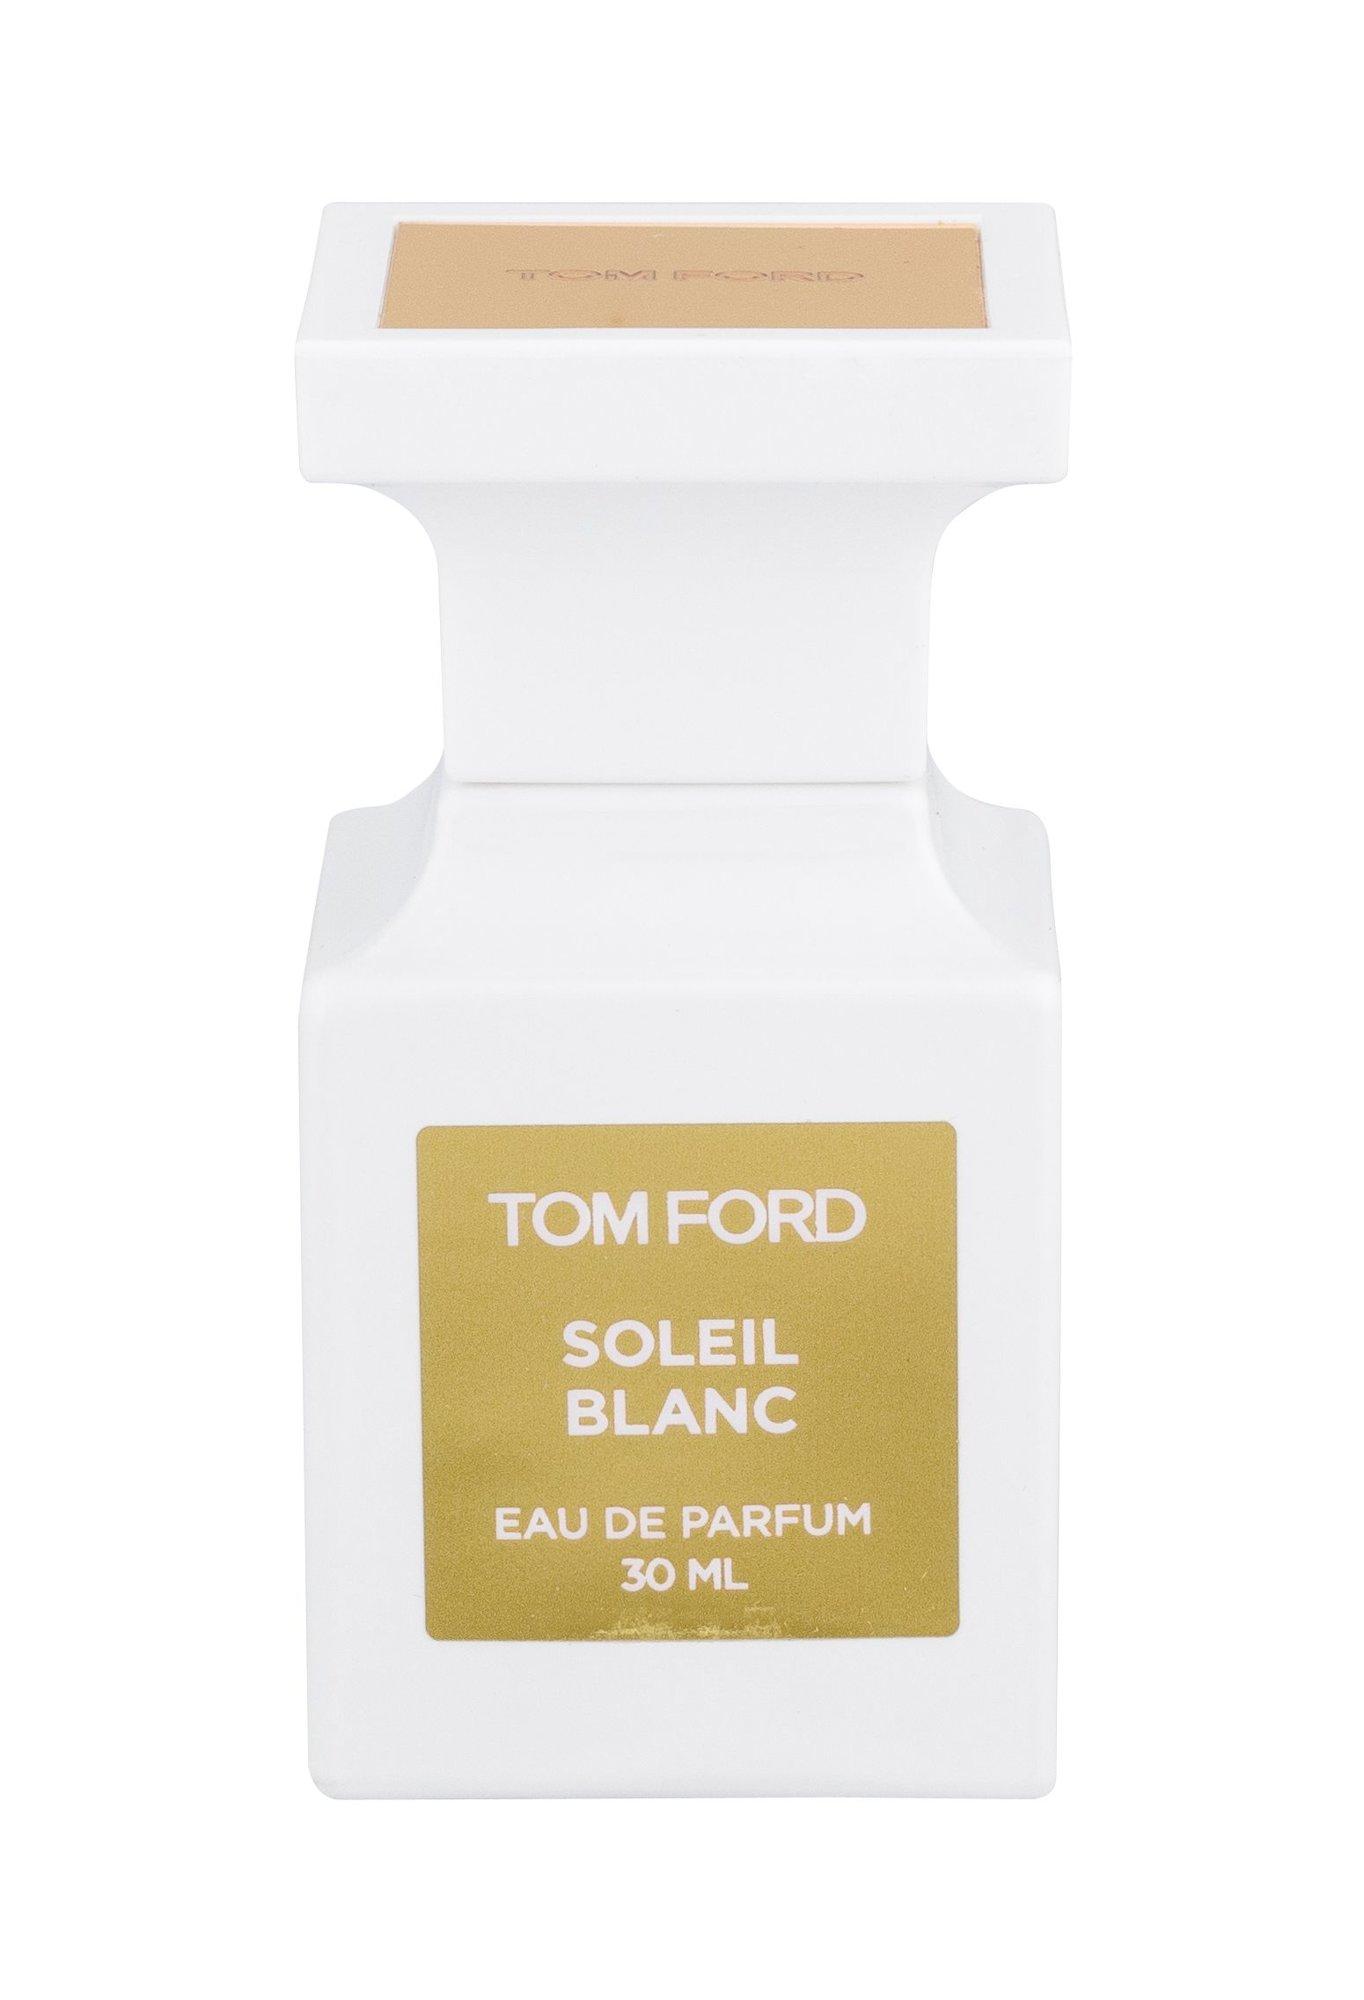 TOM FORD Soleil Blanc Eau de Parfum 30ml